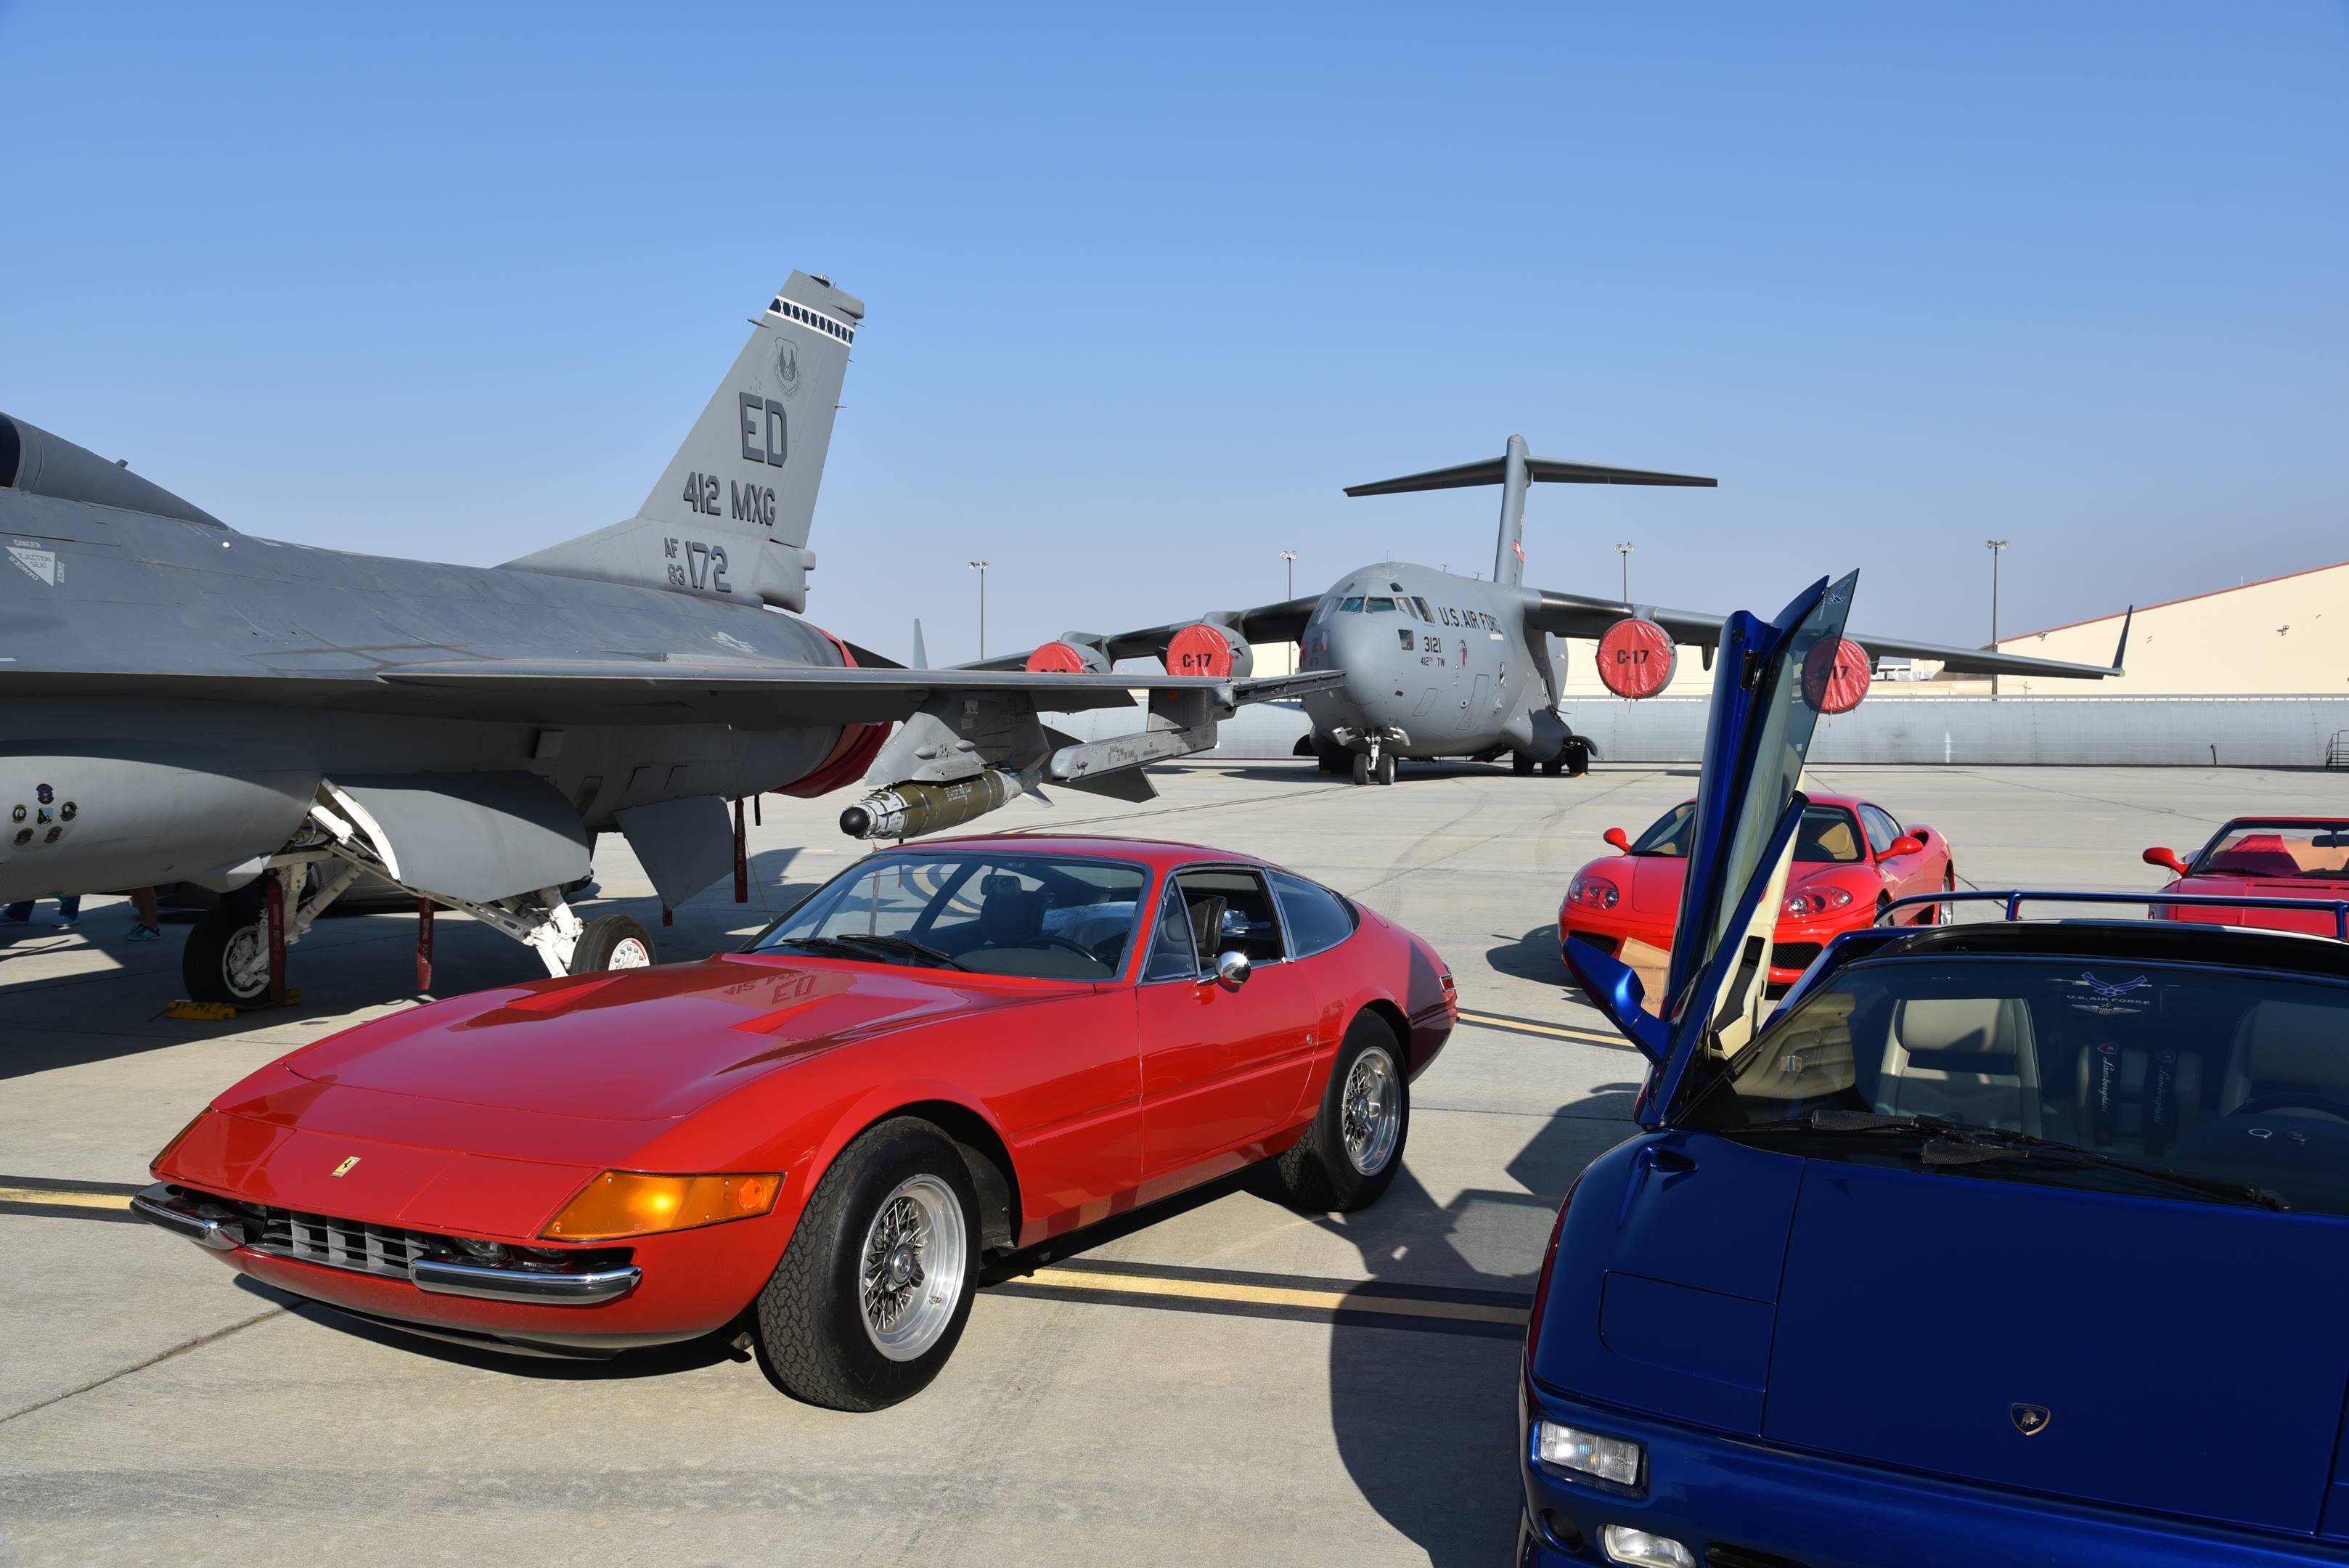 red ferrari gtb/4 daytona edwards air force base